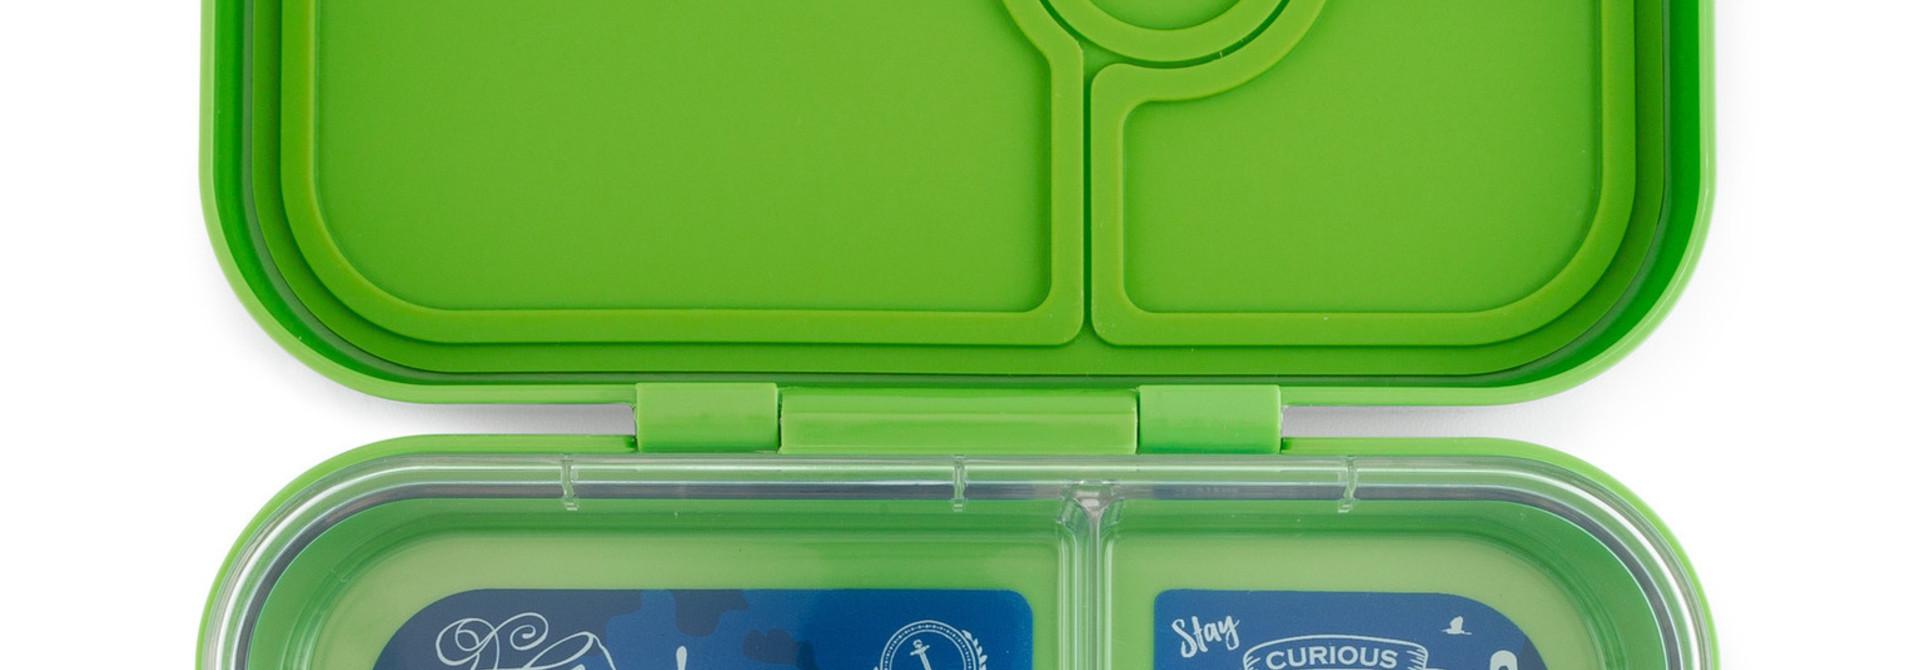 Yumbox Panino broodtrommel 4 vakken Cilantro groen / Explore tray